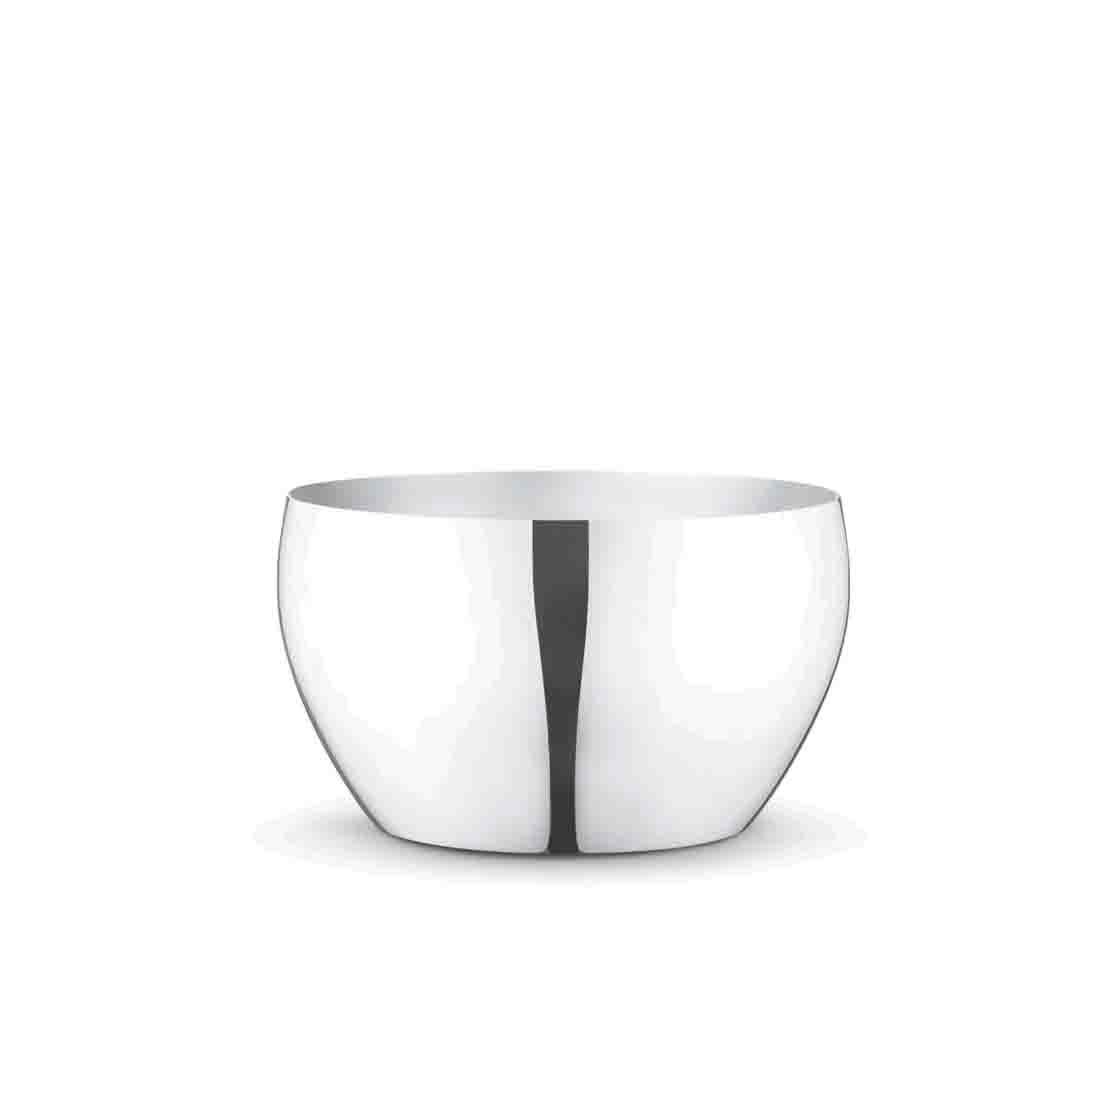 LIVING GEORG JENSEN CAFU系列 - 不鏽鋼置物皿(中型) 建議售價NT$3,500